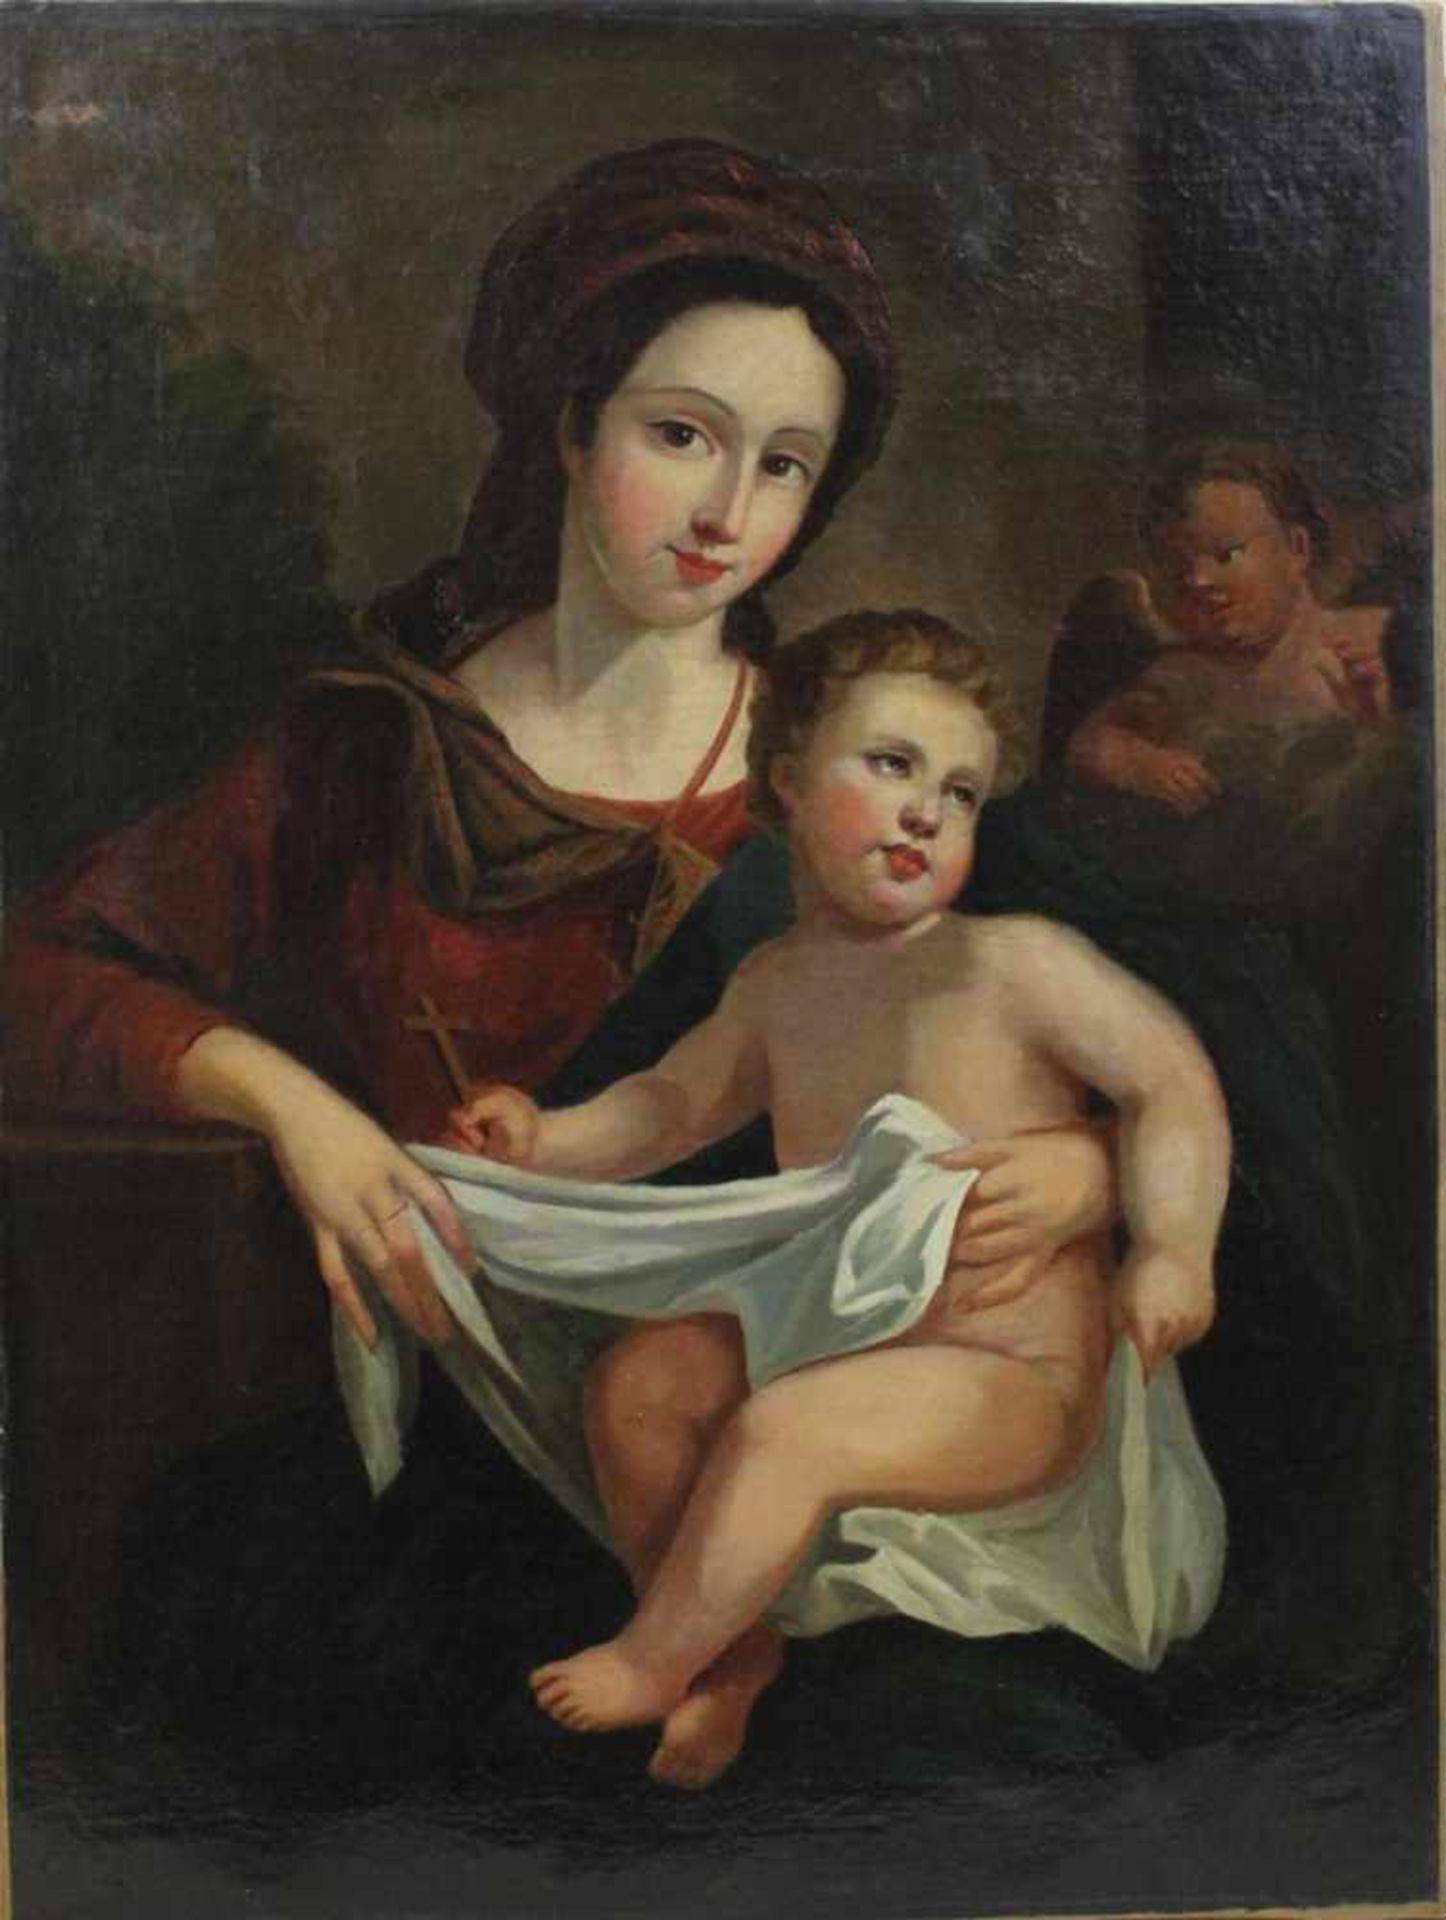 Ölgemälde Maria mit dem Jesuskind wohl Italien Ende 18 Jh., Öl auf Leinwand, o. Rahmen, ca. 76,5 x